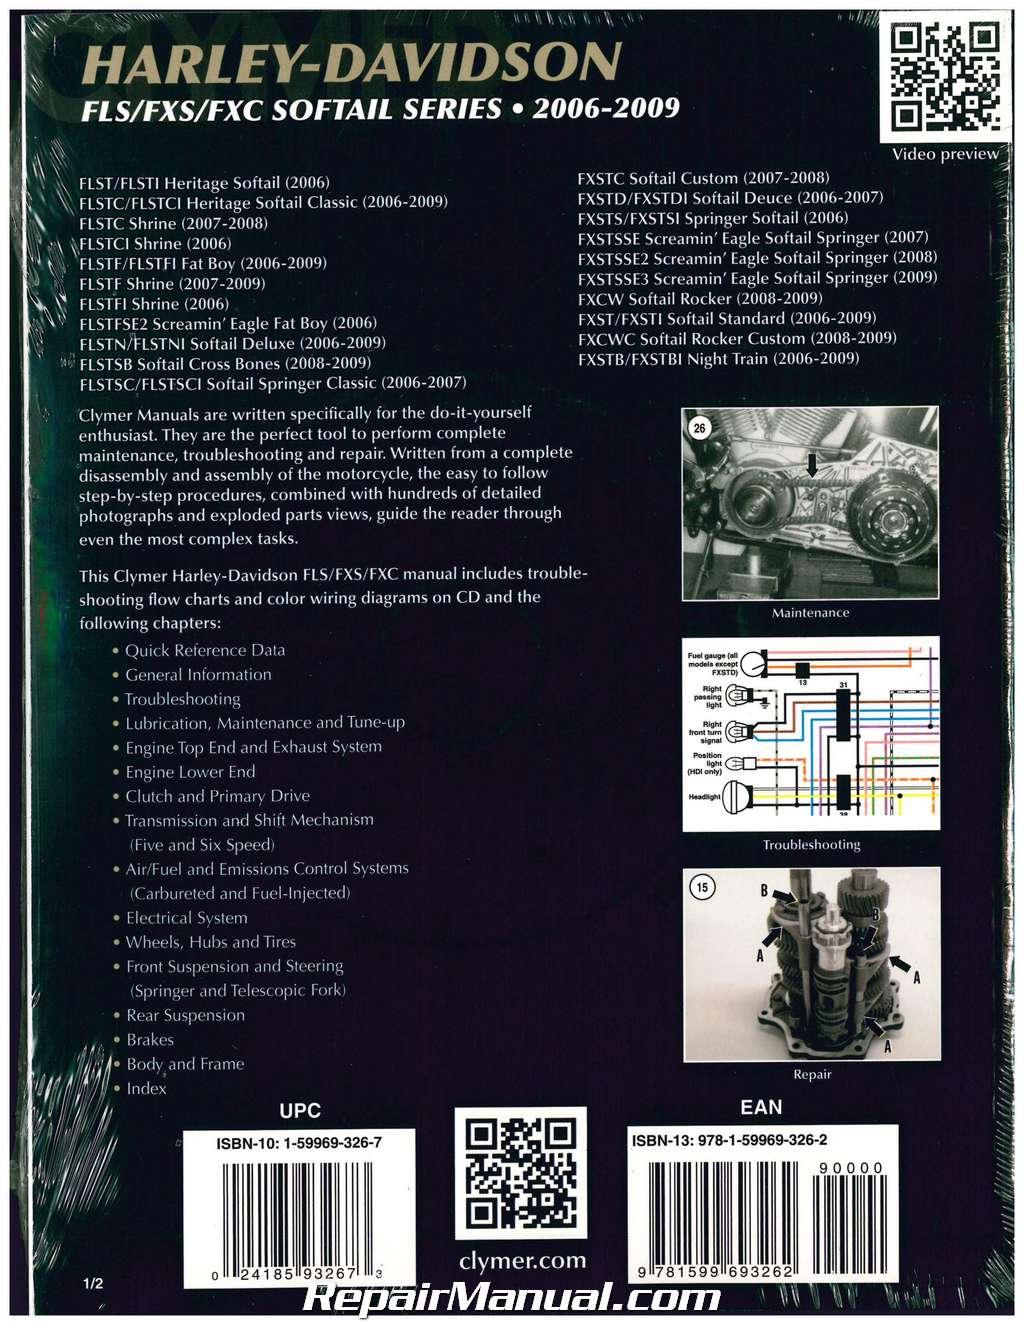 ... Array - clymer harley davidson softail fls fxs fxc motorcycle repair  manual rh repairmanual com